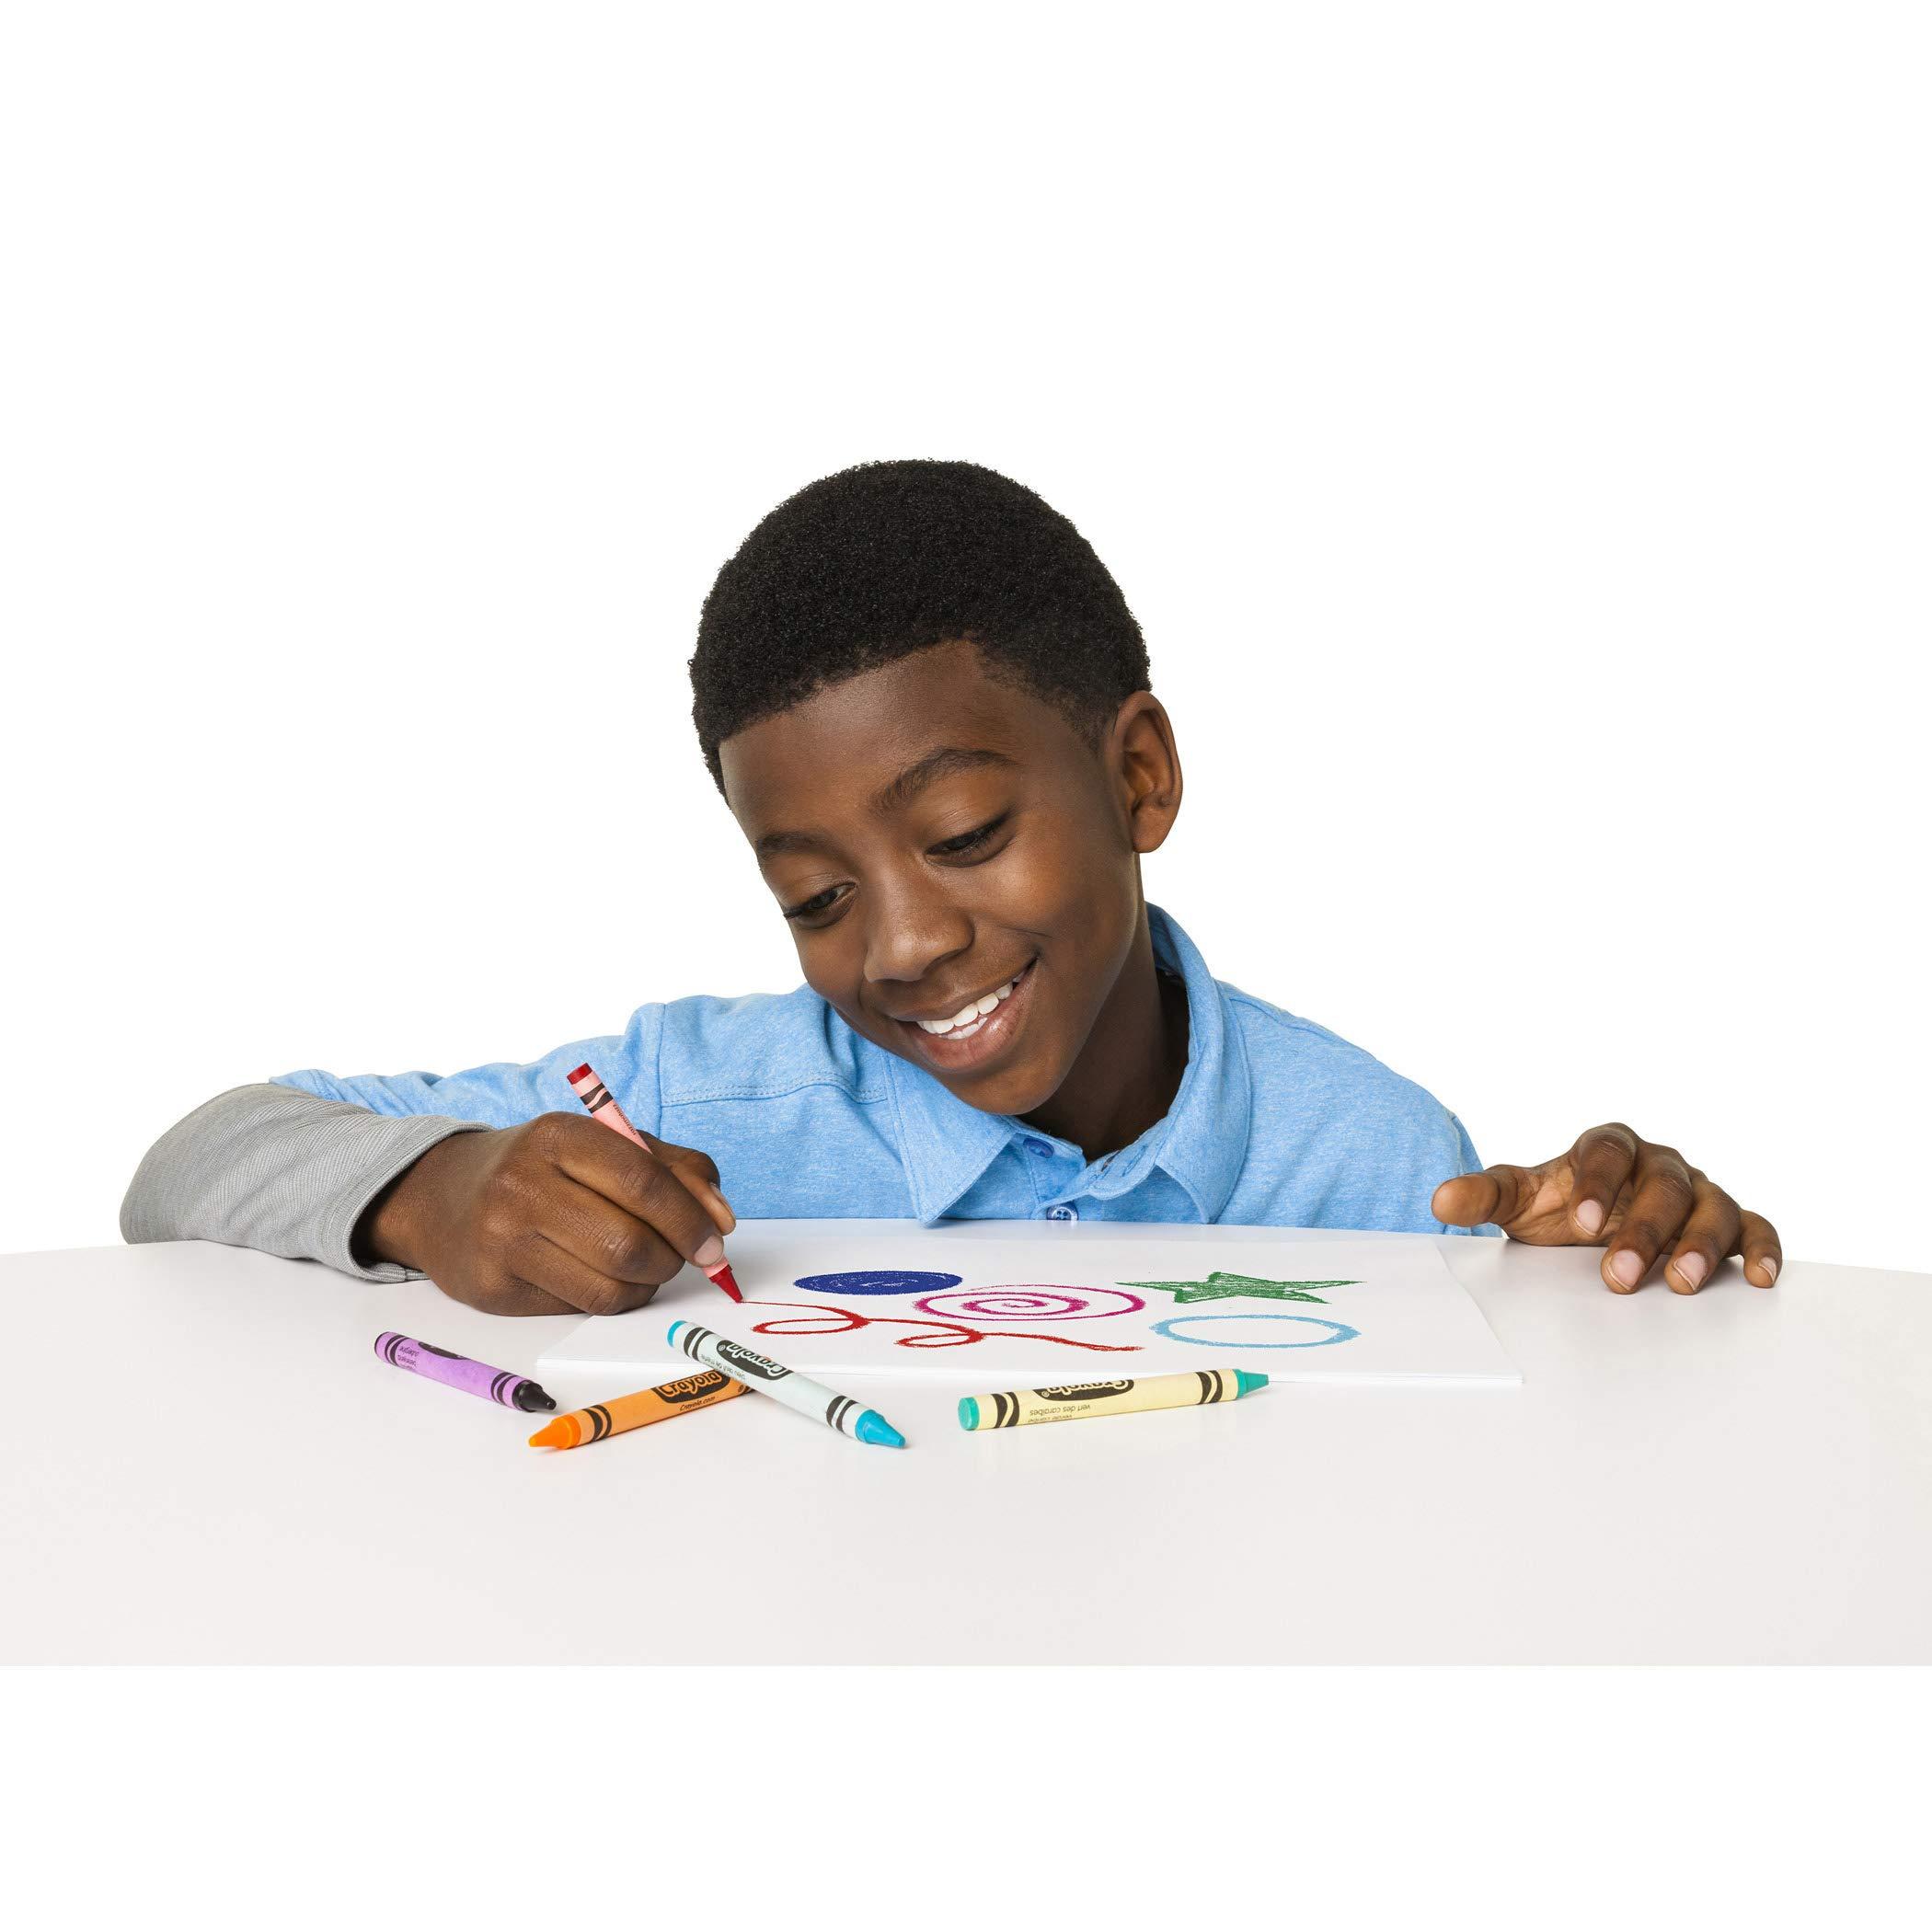 Crayola BIN528019 Crayon Classpack, Reg Size, 64 Colors, Pack of 832 by Crayola (Image #3)